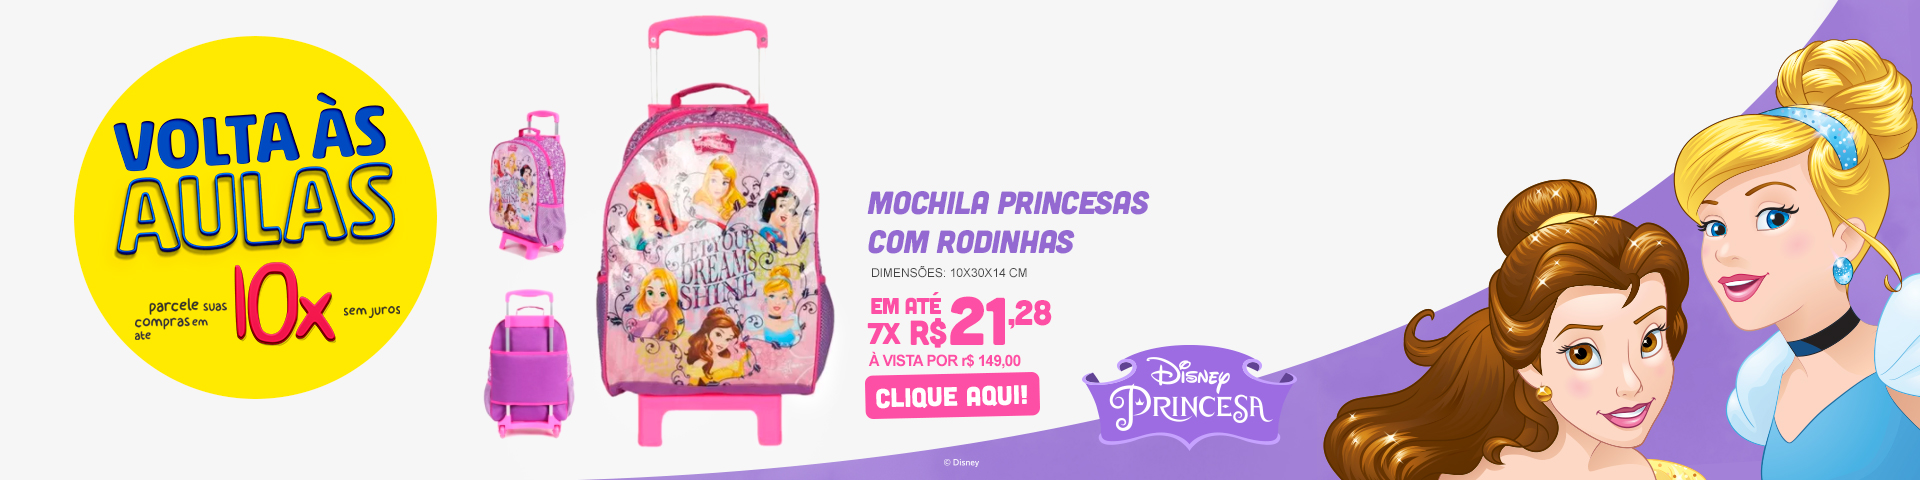 Mochila Princesas